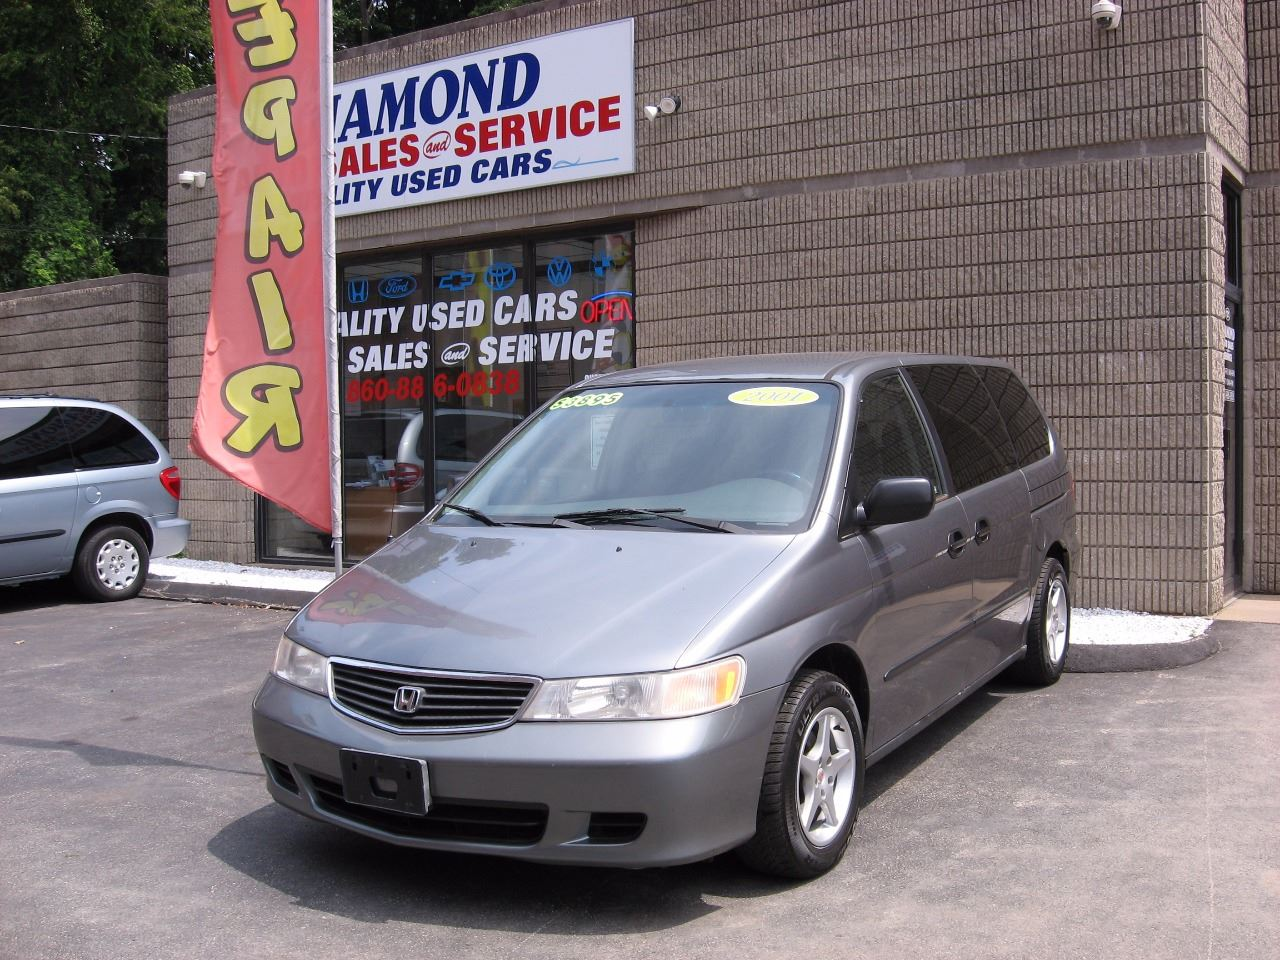 2001 Honda Odyssey for sale at Diamond Auto Sales & Service in Norwich CT